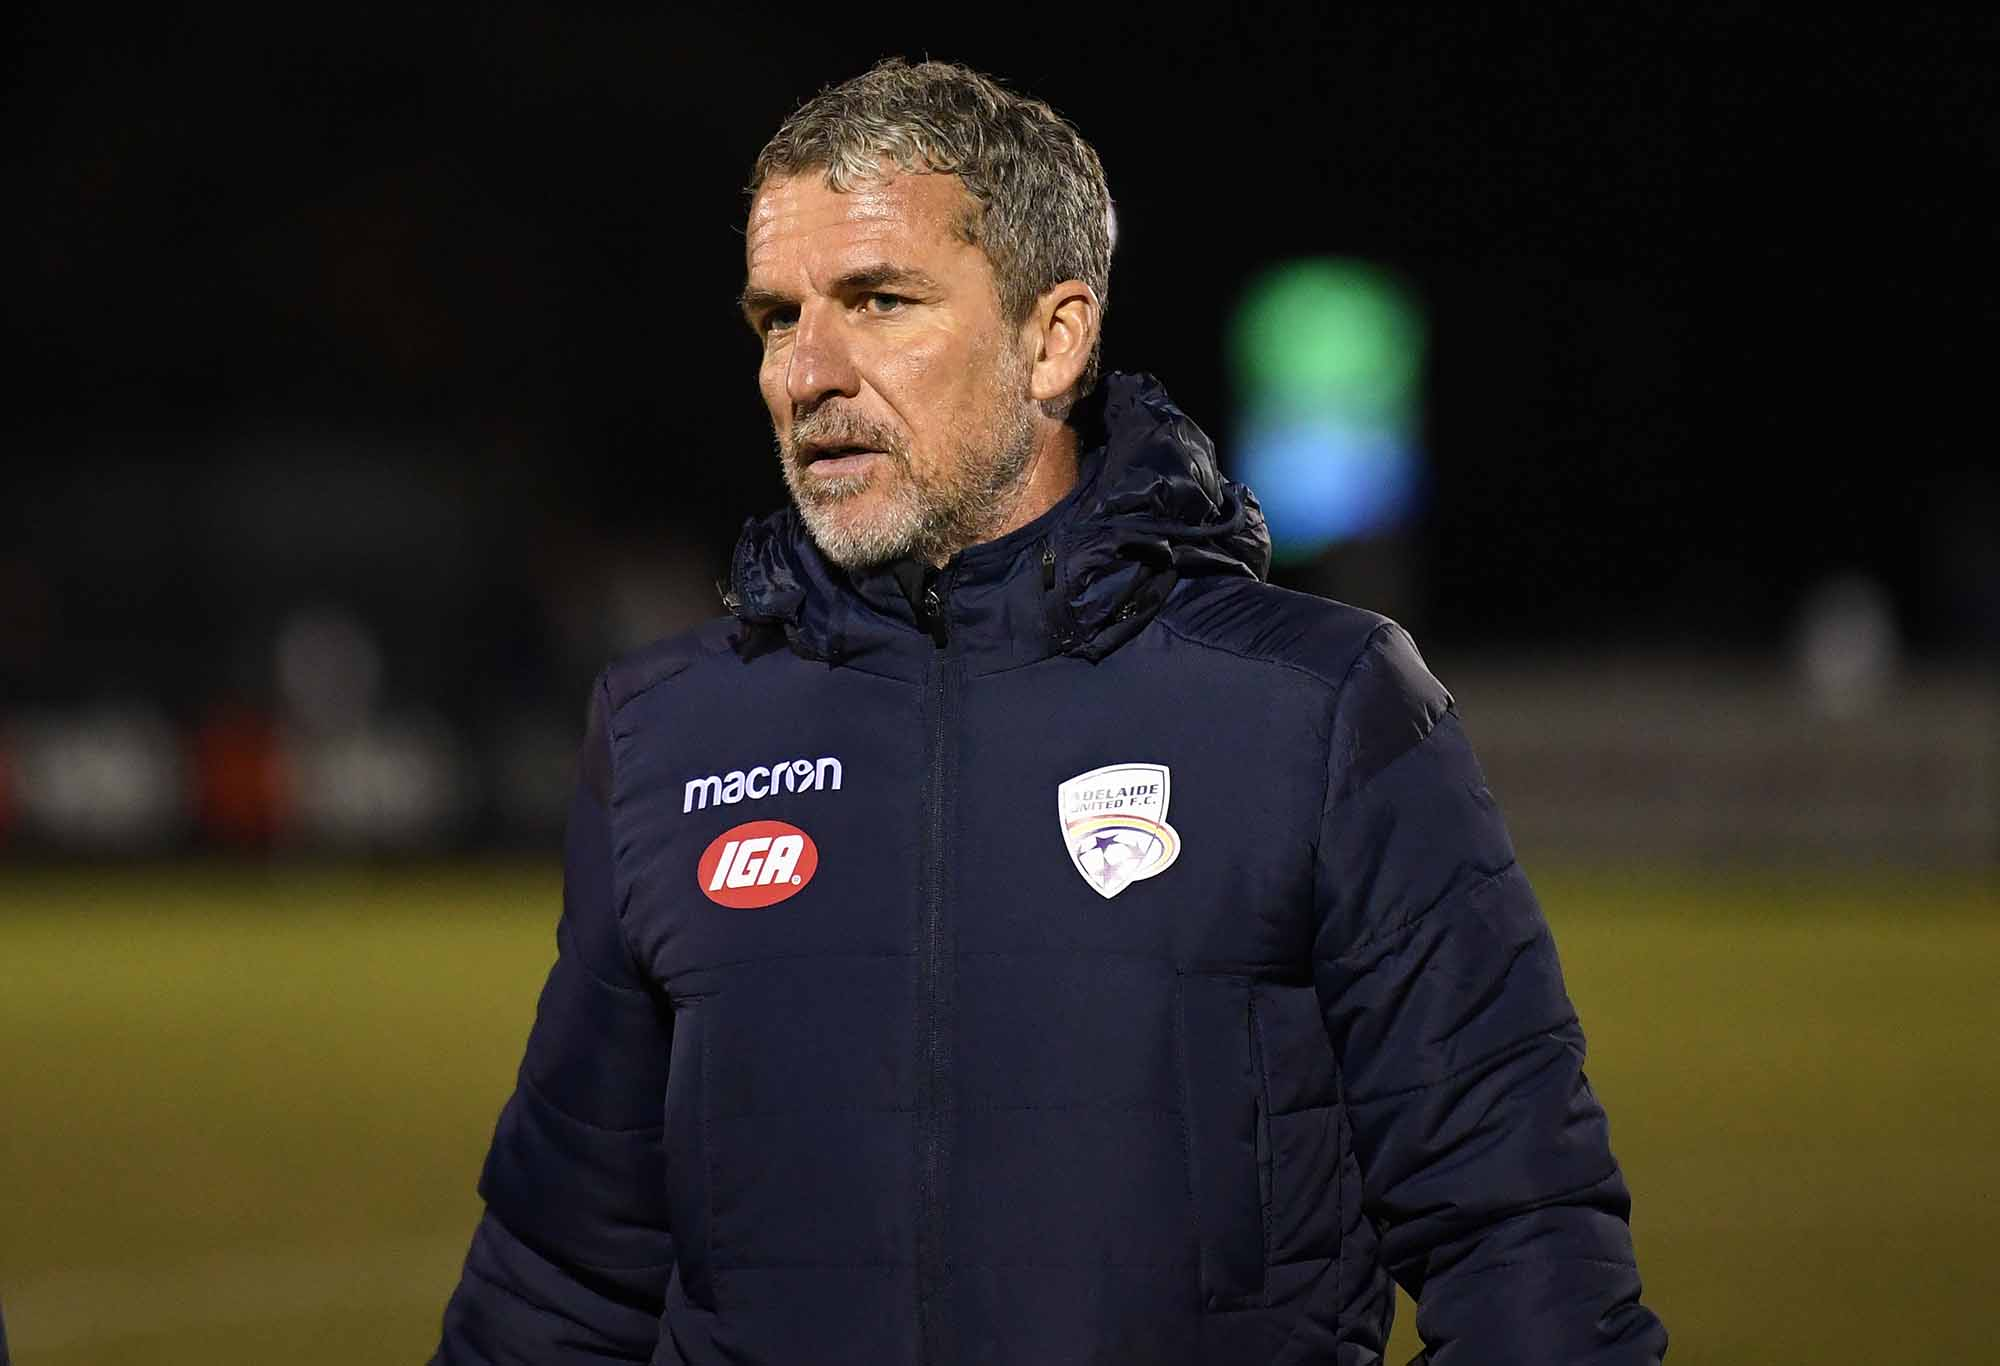 Adelaide coach Marco Kurz